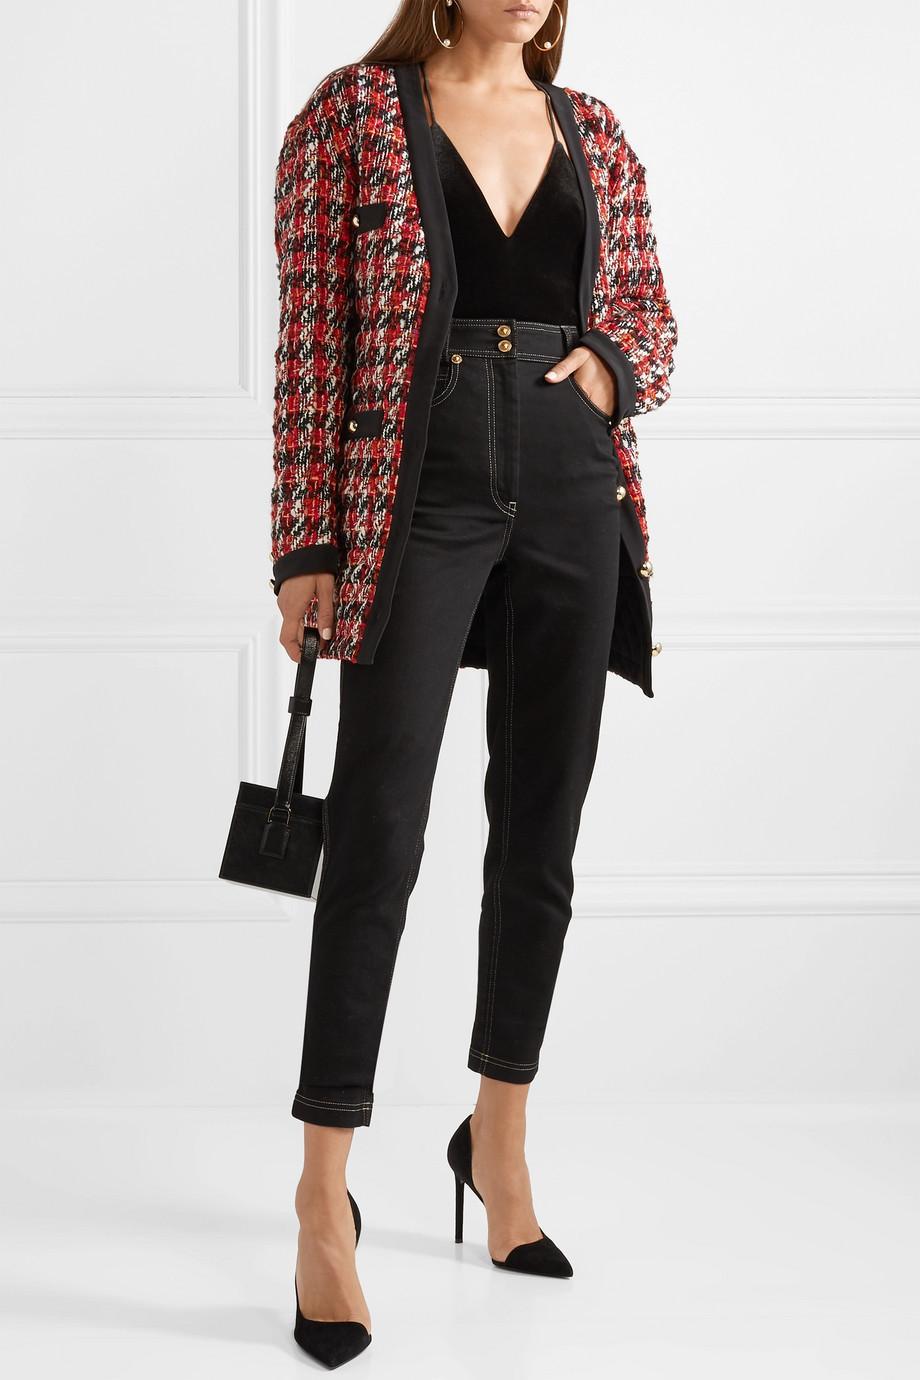 Alessandra Rich Oversized bouclé-tweed cardigan $694.50